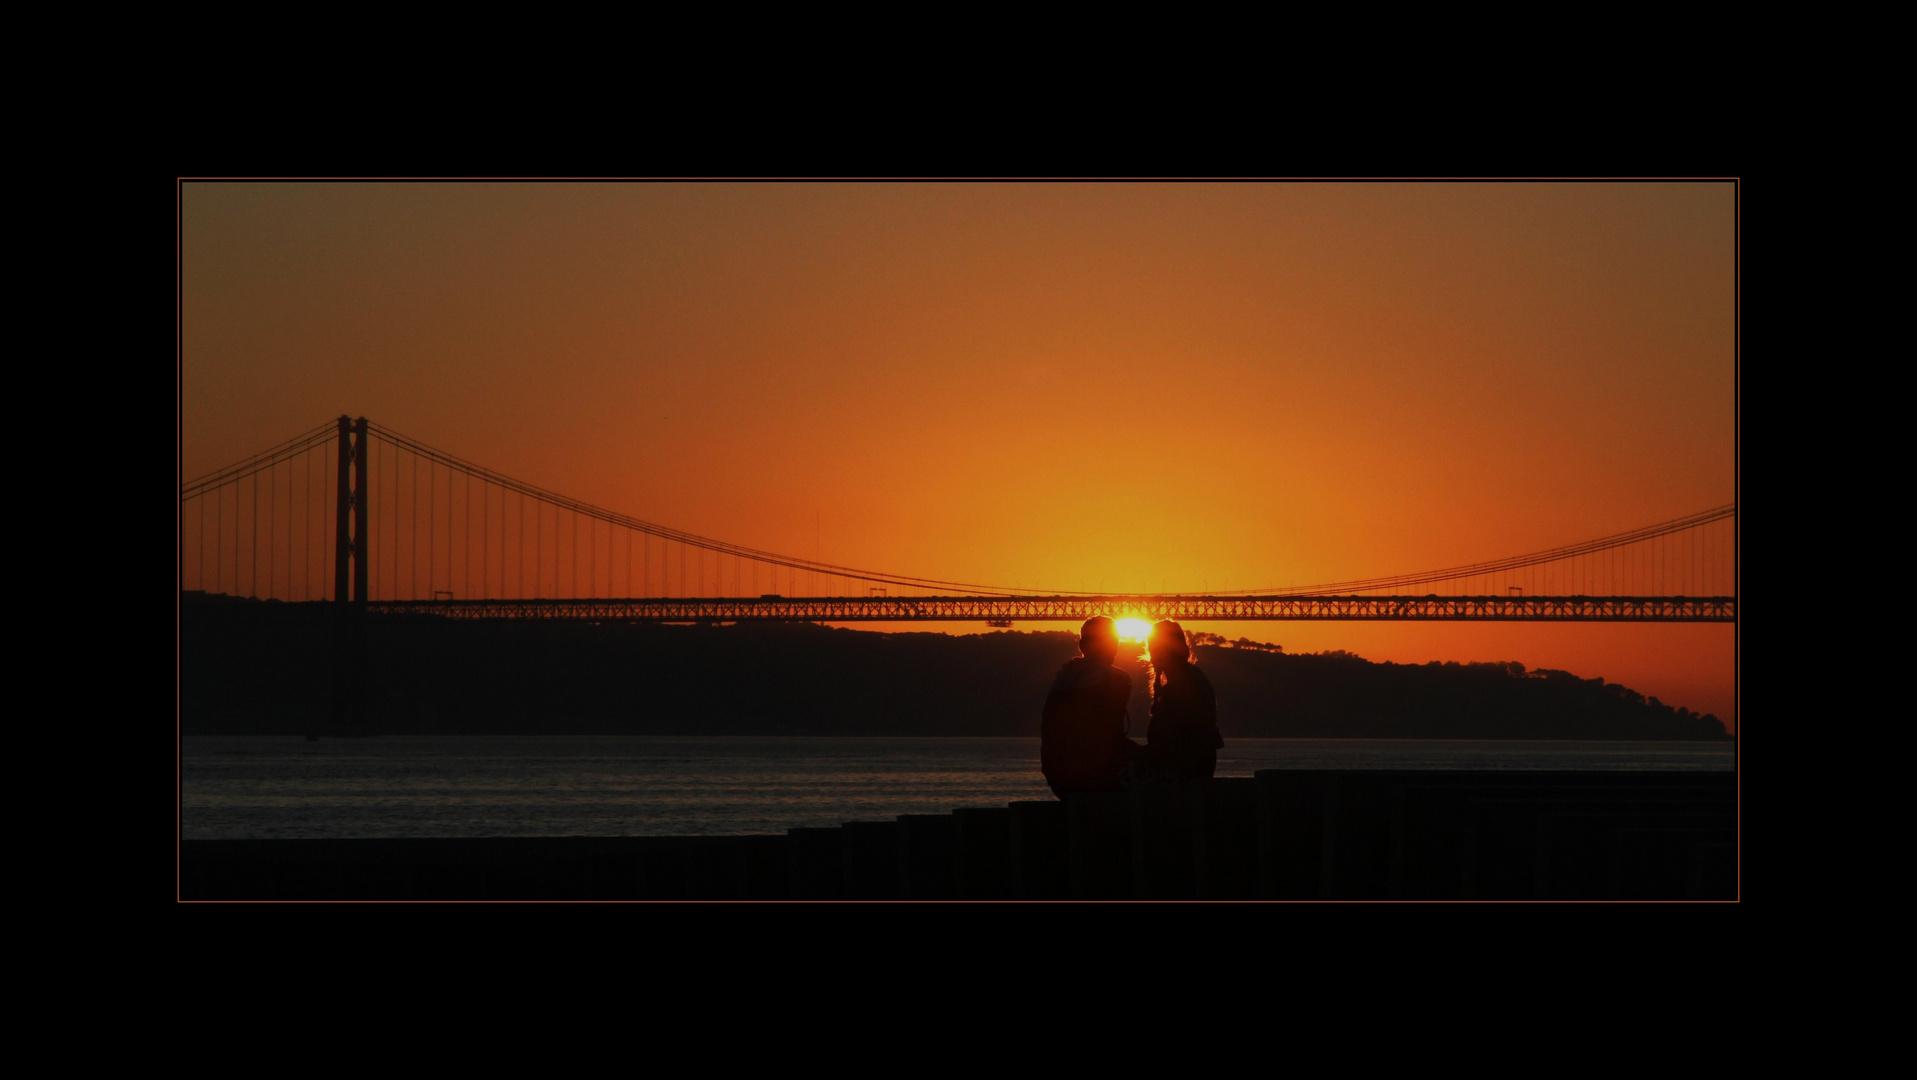 Lisboa Loving Sunset